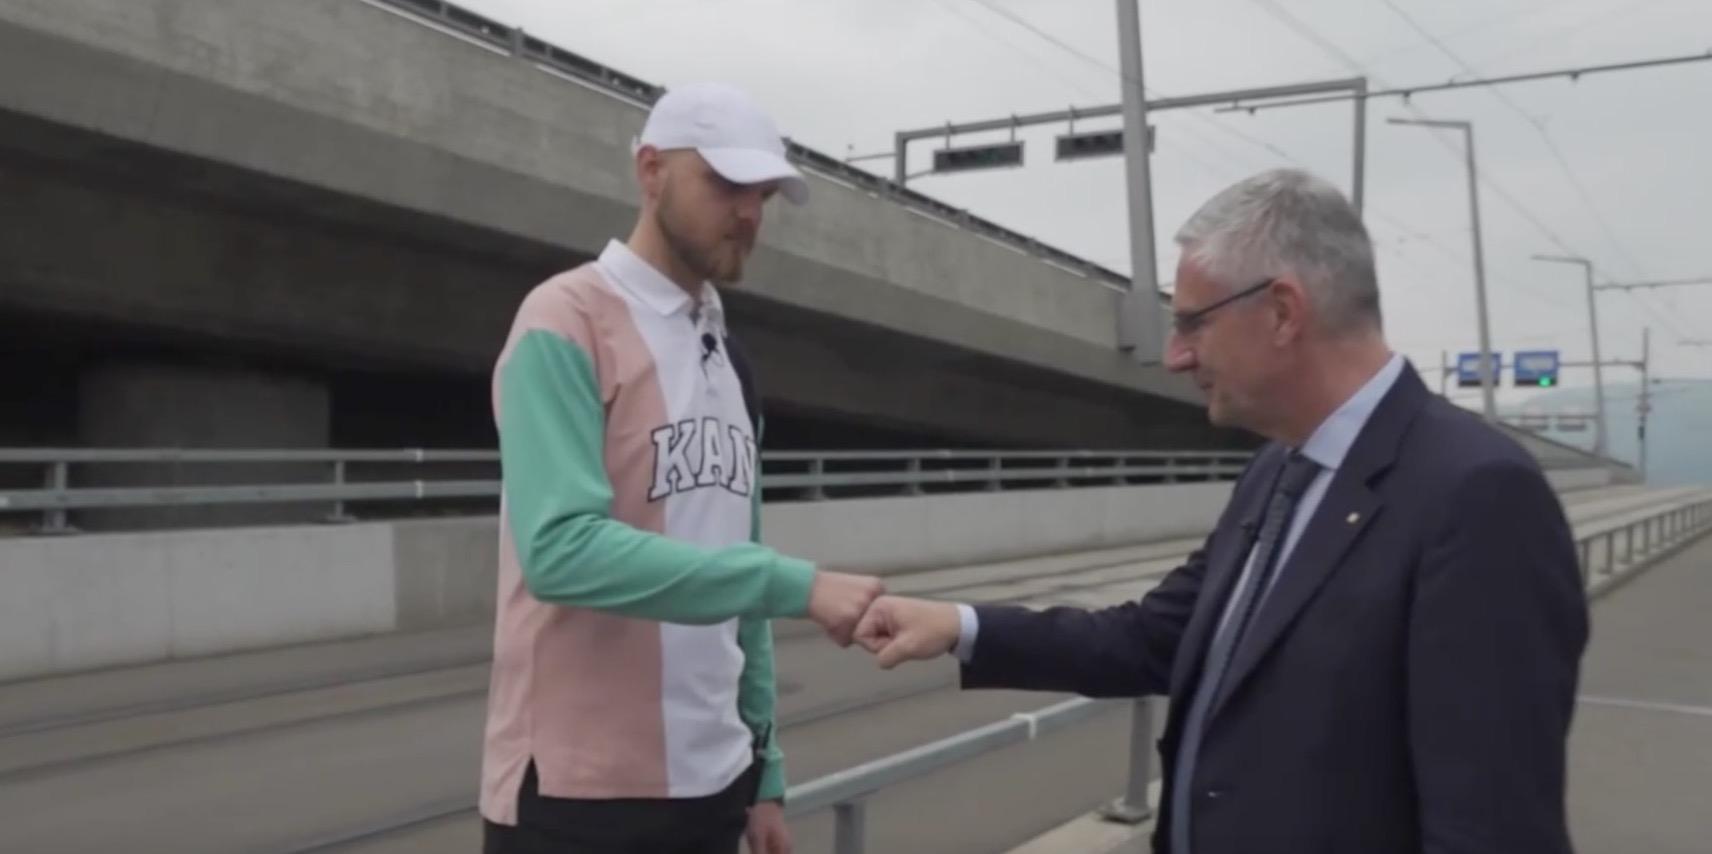 Showdown? Milli54 trifft auf SVP-Politiker Andreas Glarner